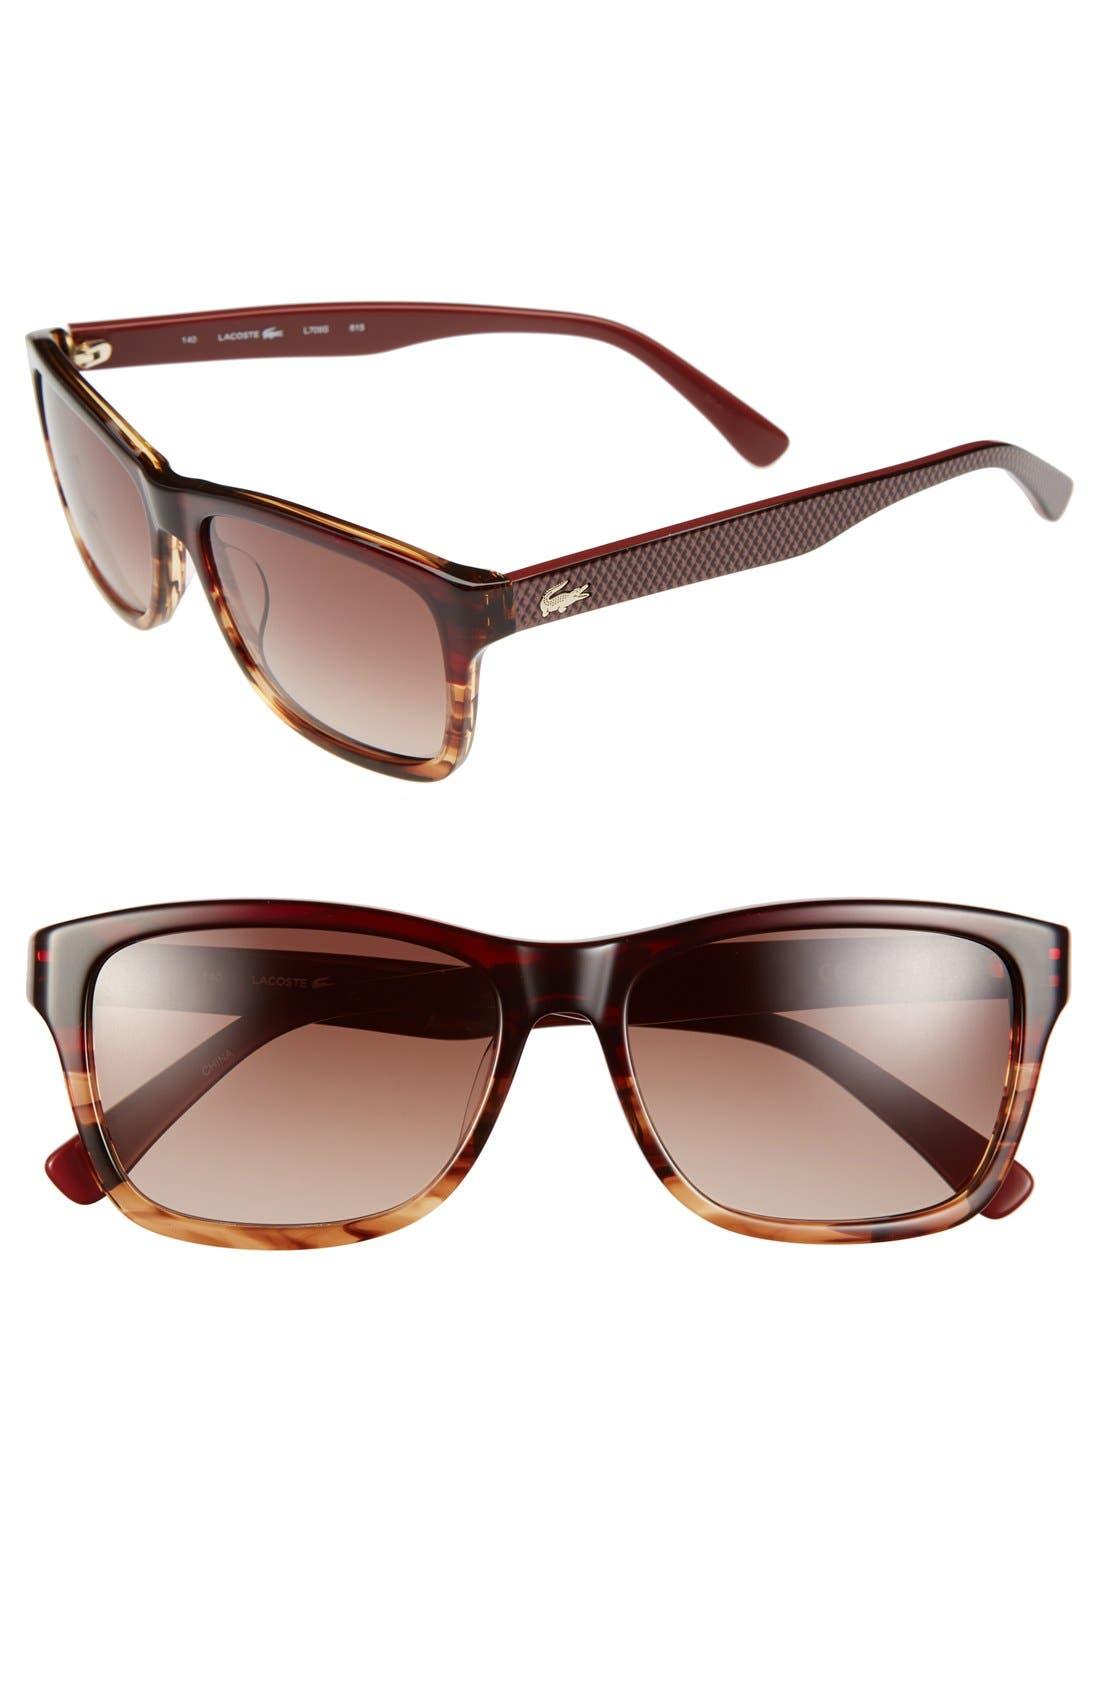 Alternate Image 1 Selected - Lacoste 55mm Rectangular Sunglasses